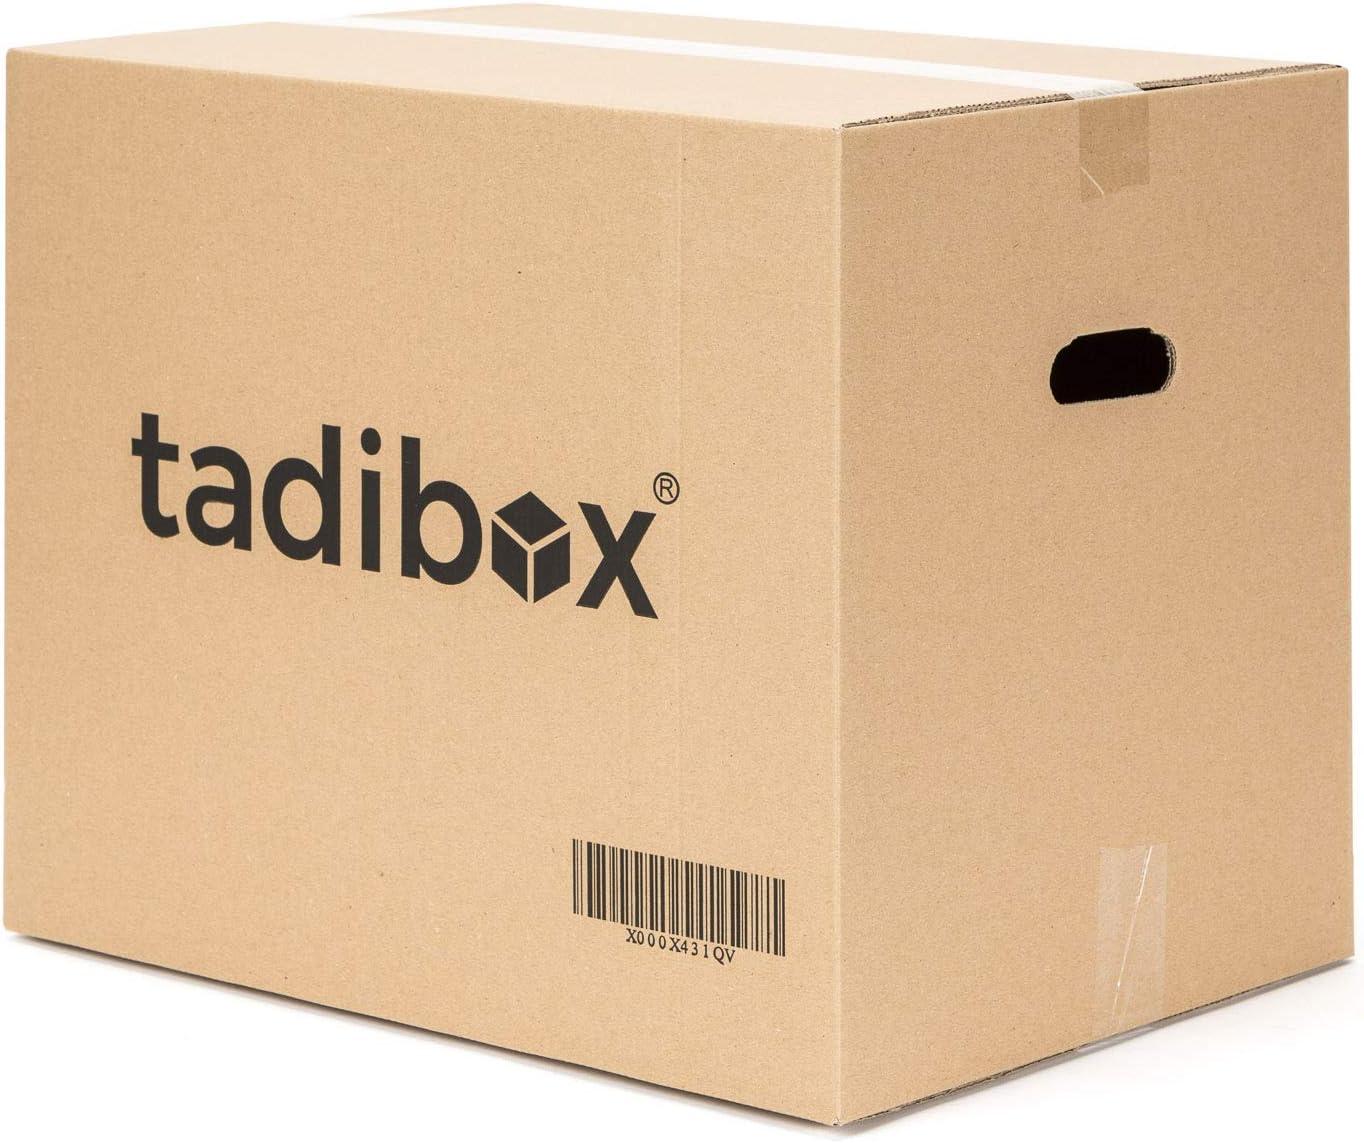 6 Cajas de Cartón para Mudanza (Talla XL) con Asas - Extra Resistentes Fabricadas en España - 55x35x40cm Canal Doble Alta Calidad Reforzado - Combinalas (M/L/XL) y optimiza tu mudanza!